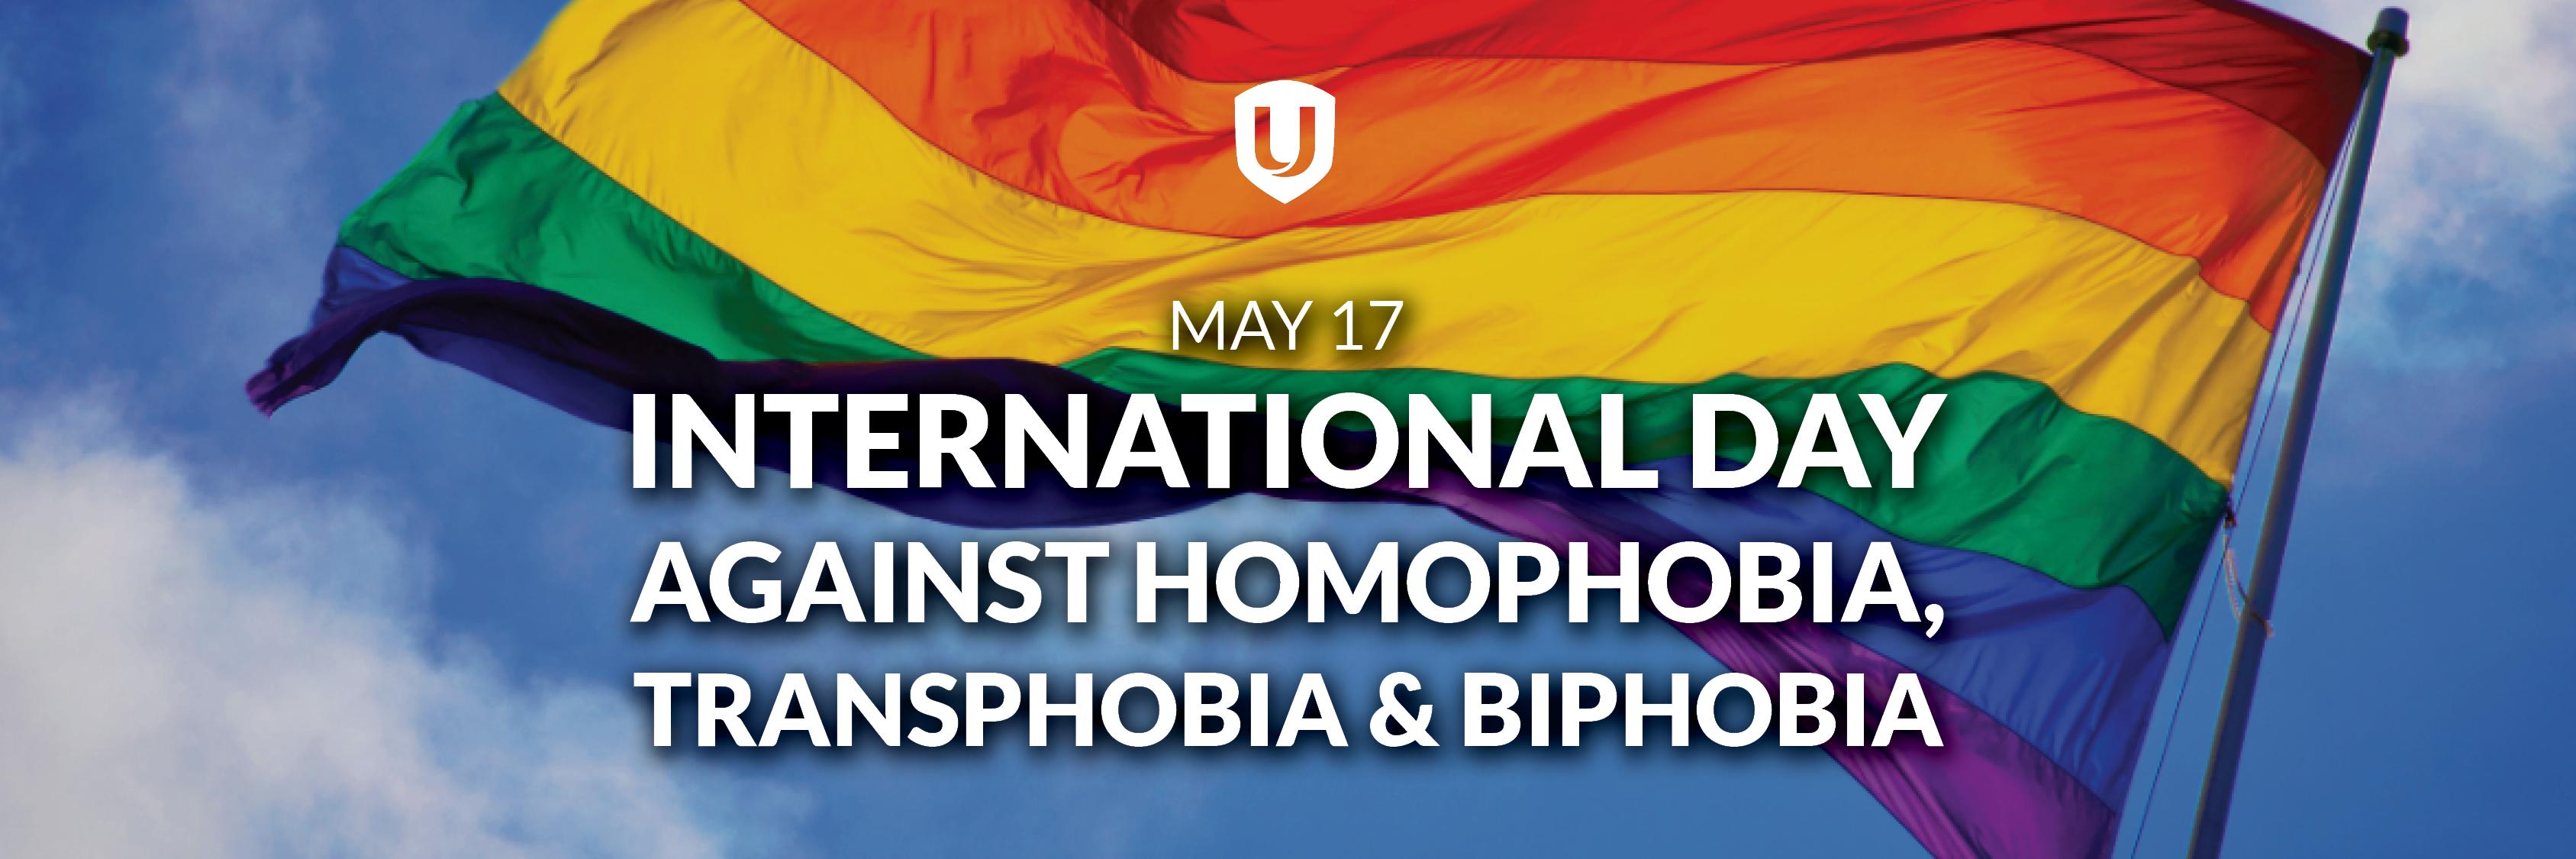 International Day Agains Homophobia, Transphobia and Biphobia